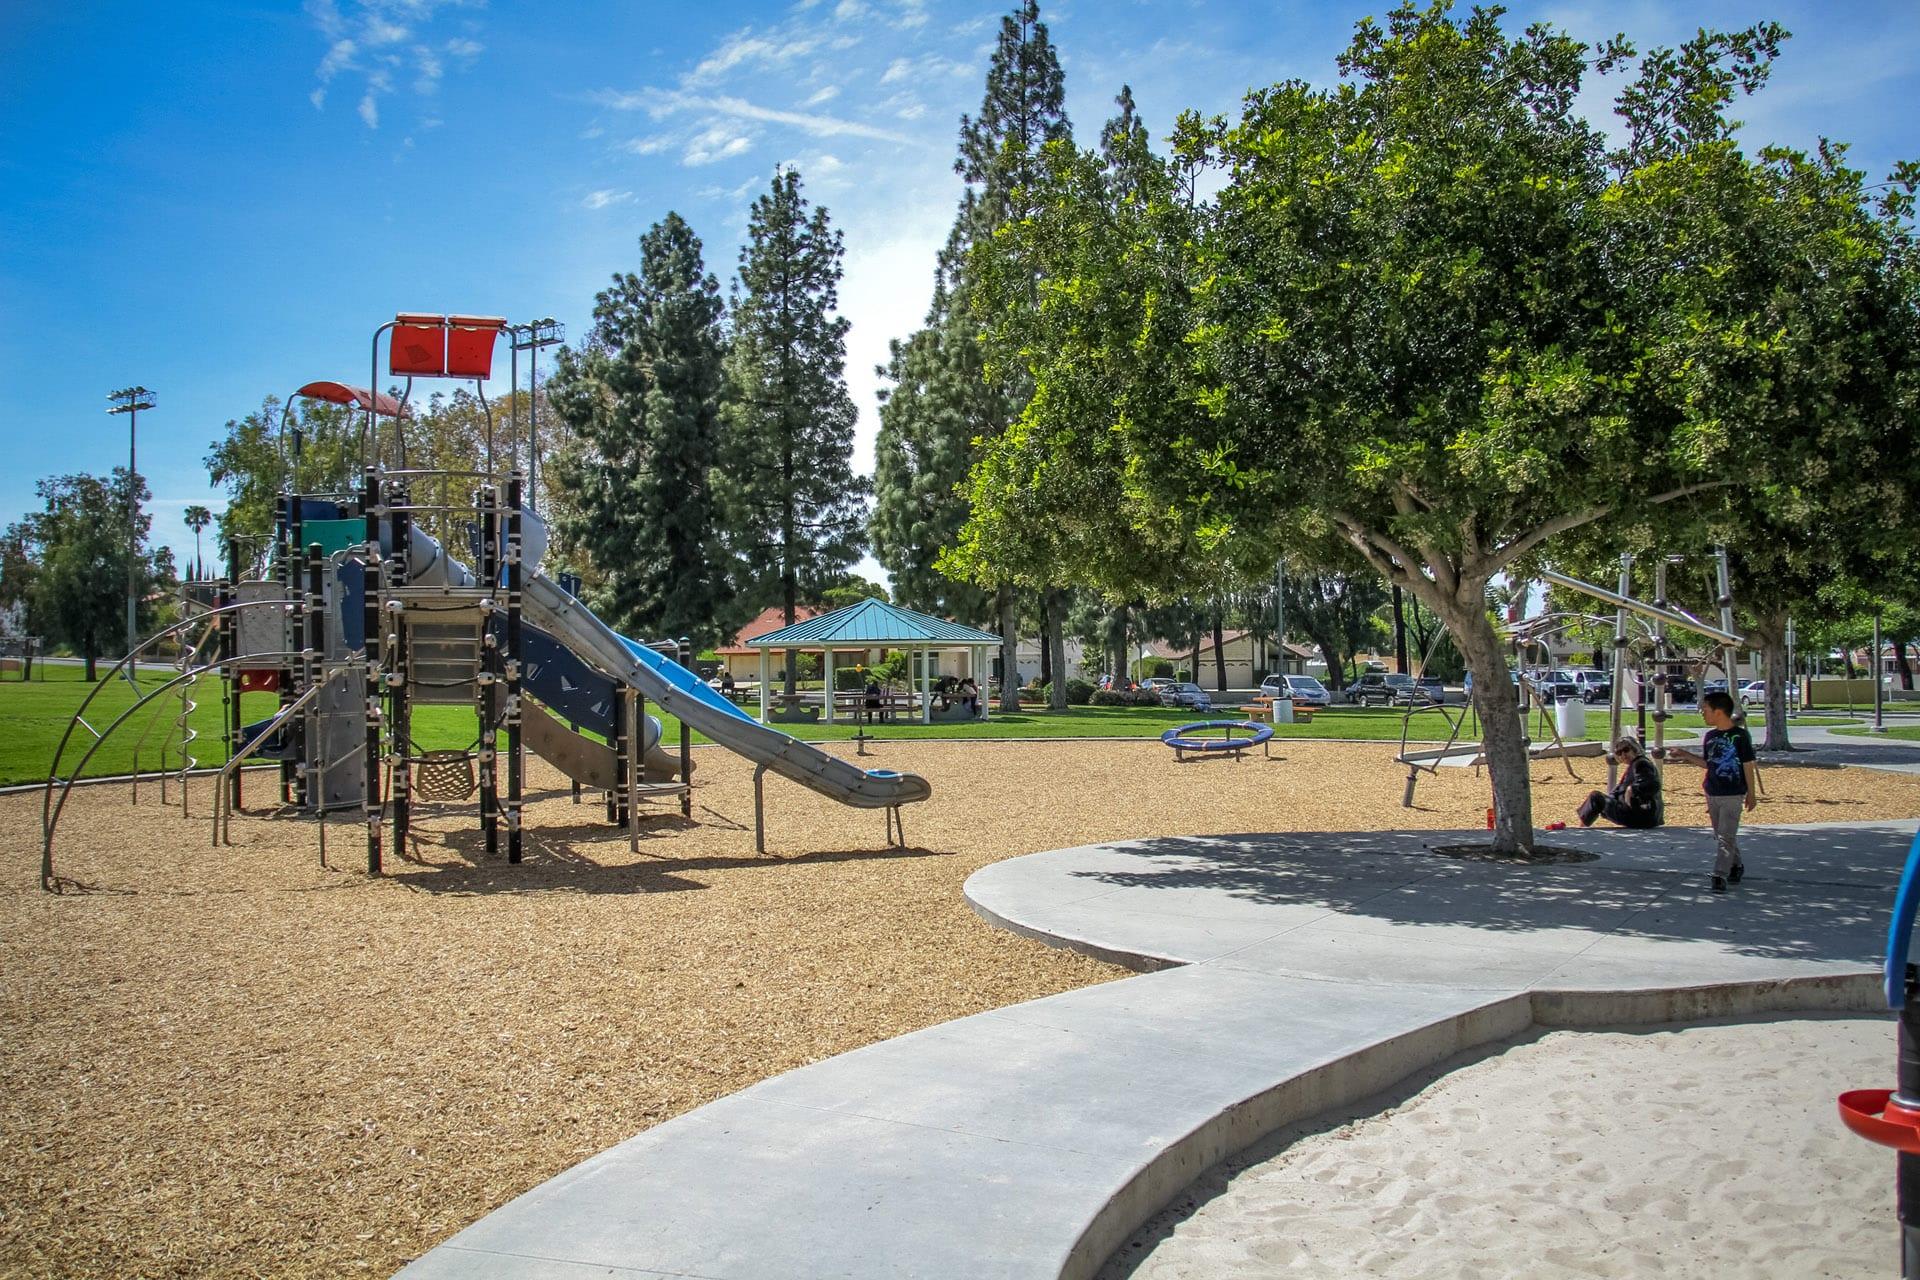 Playground next to a concrete walkway